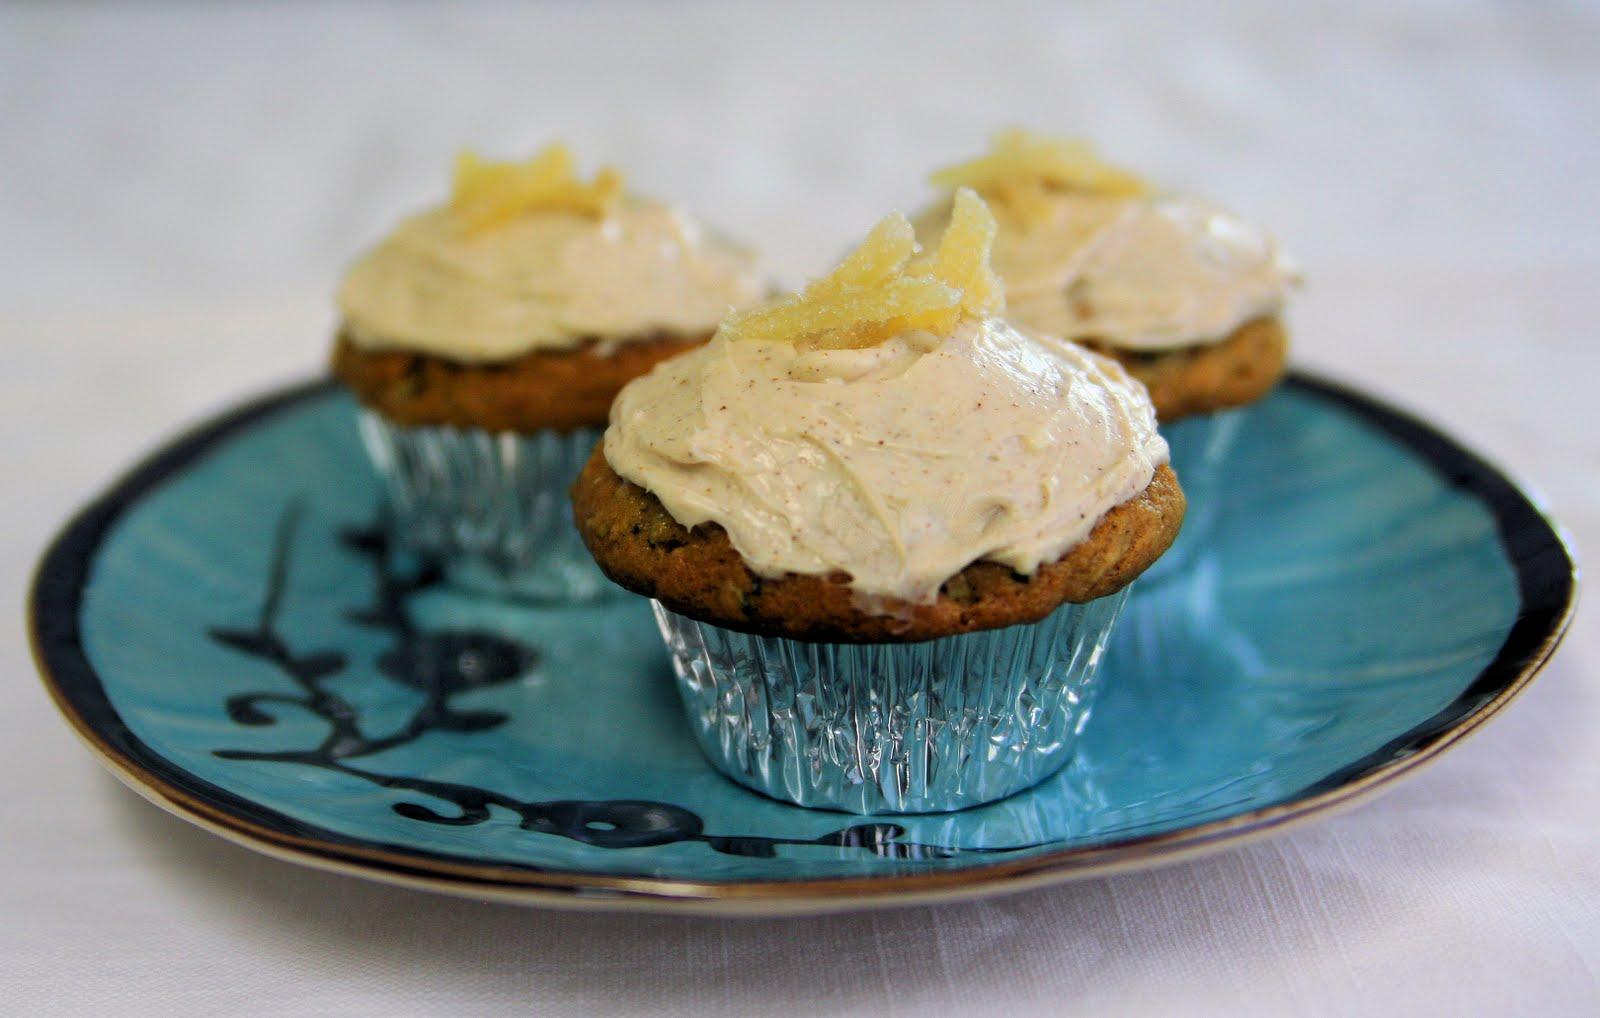 Through My View: Zucchini Ginger Cupcakes